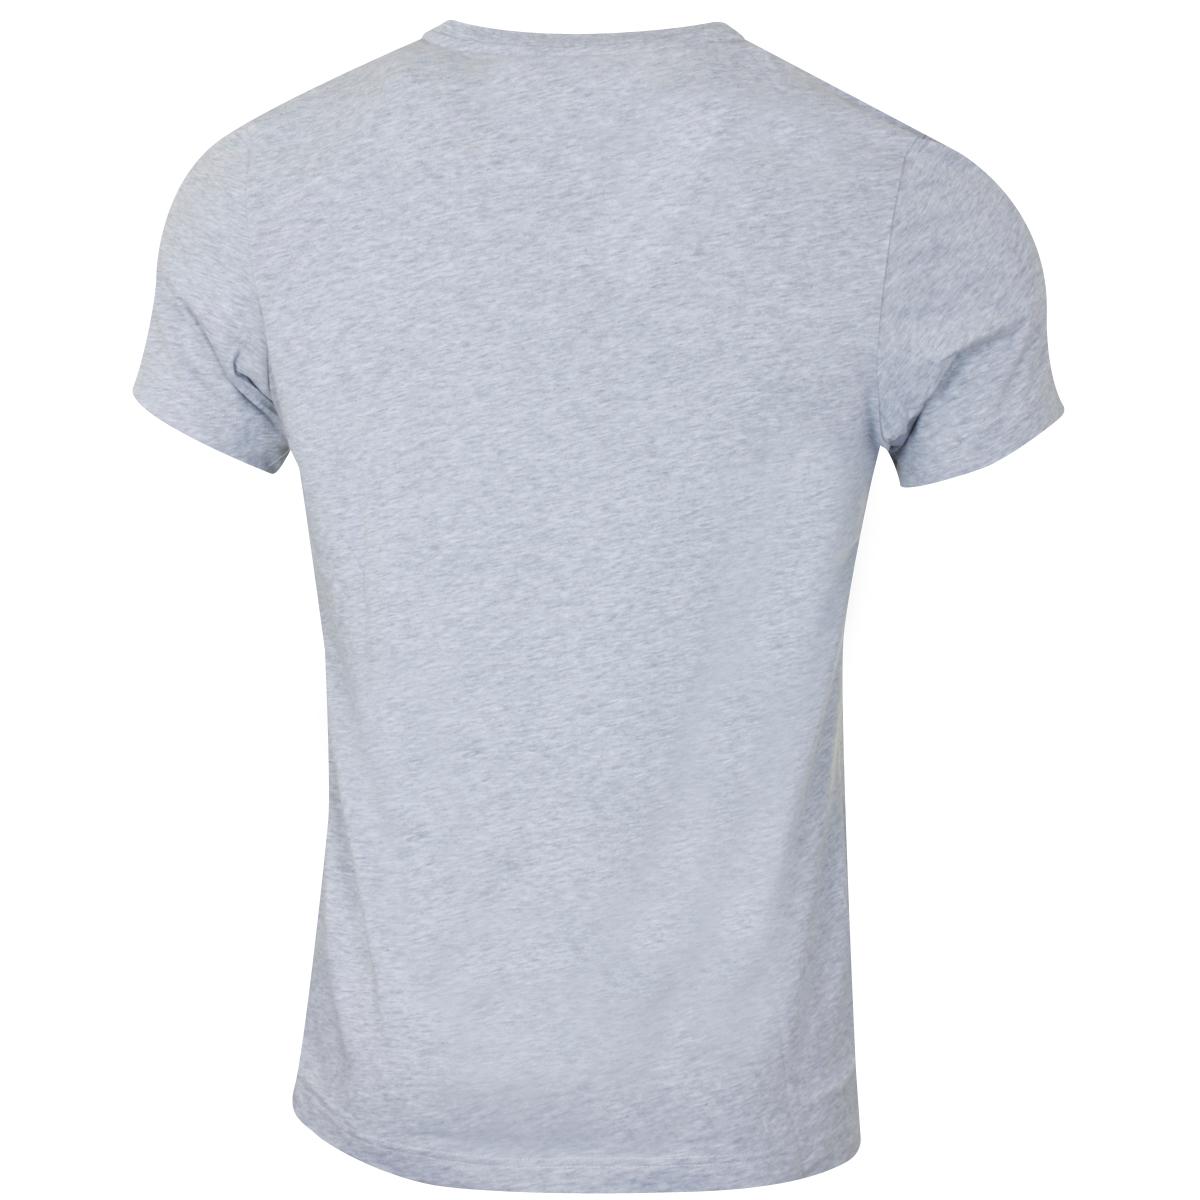 Lacoste-Mens-Oversized-Crocodile-Ultra-Dry-Cotton-Blend-T-Shirt-30-OFF-RRP thumbnail 15